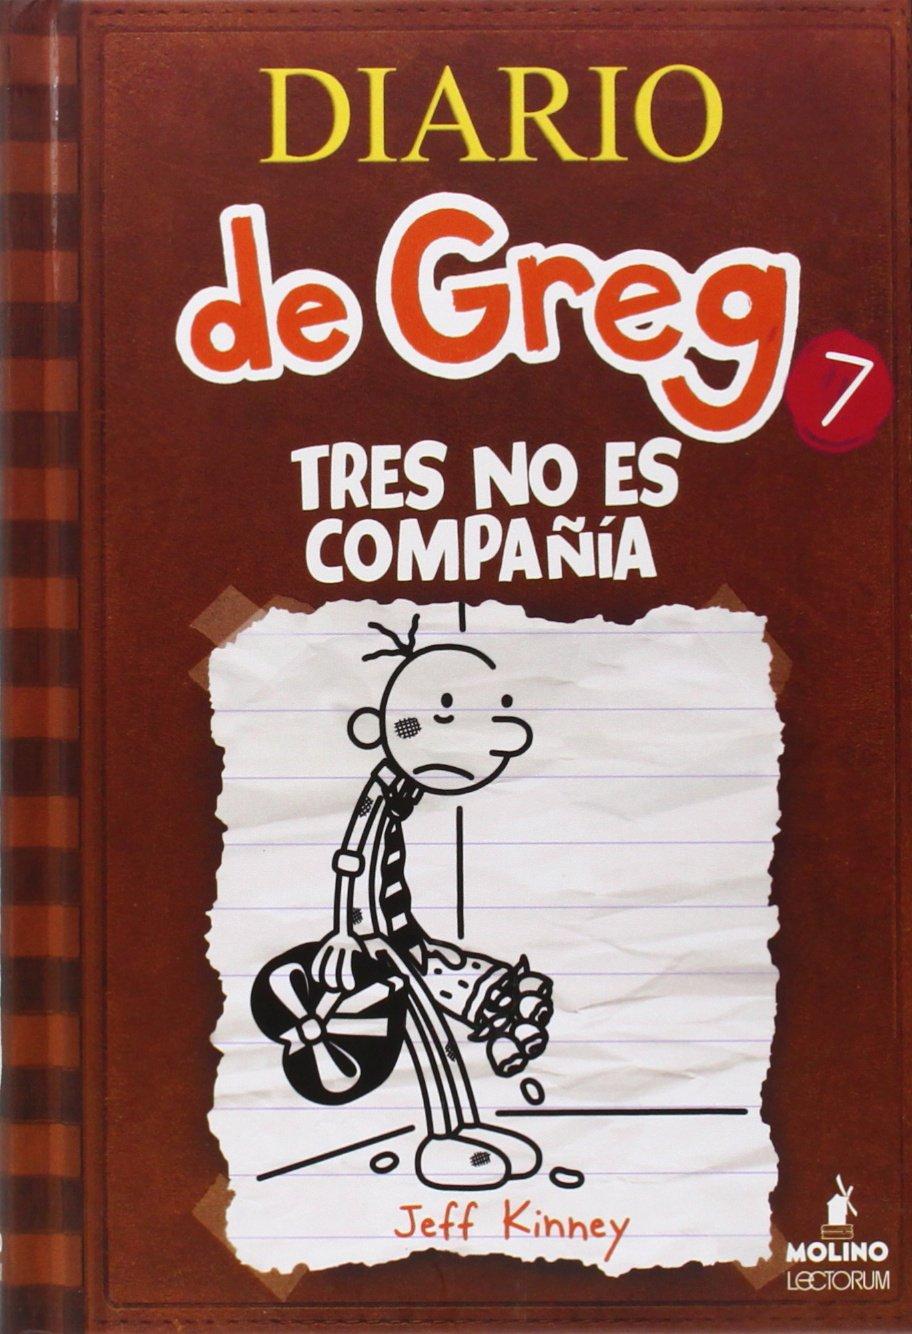 Diario Greg compa%C3%B1%C3%ADa Spanish Diary product image